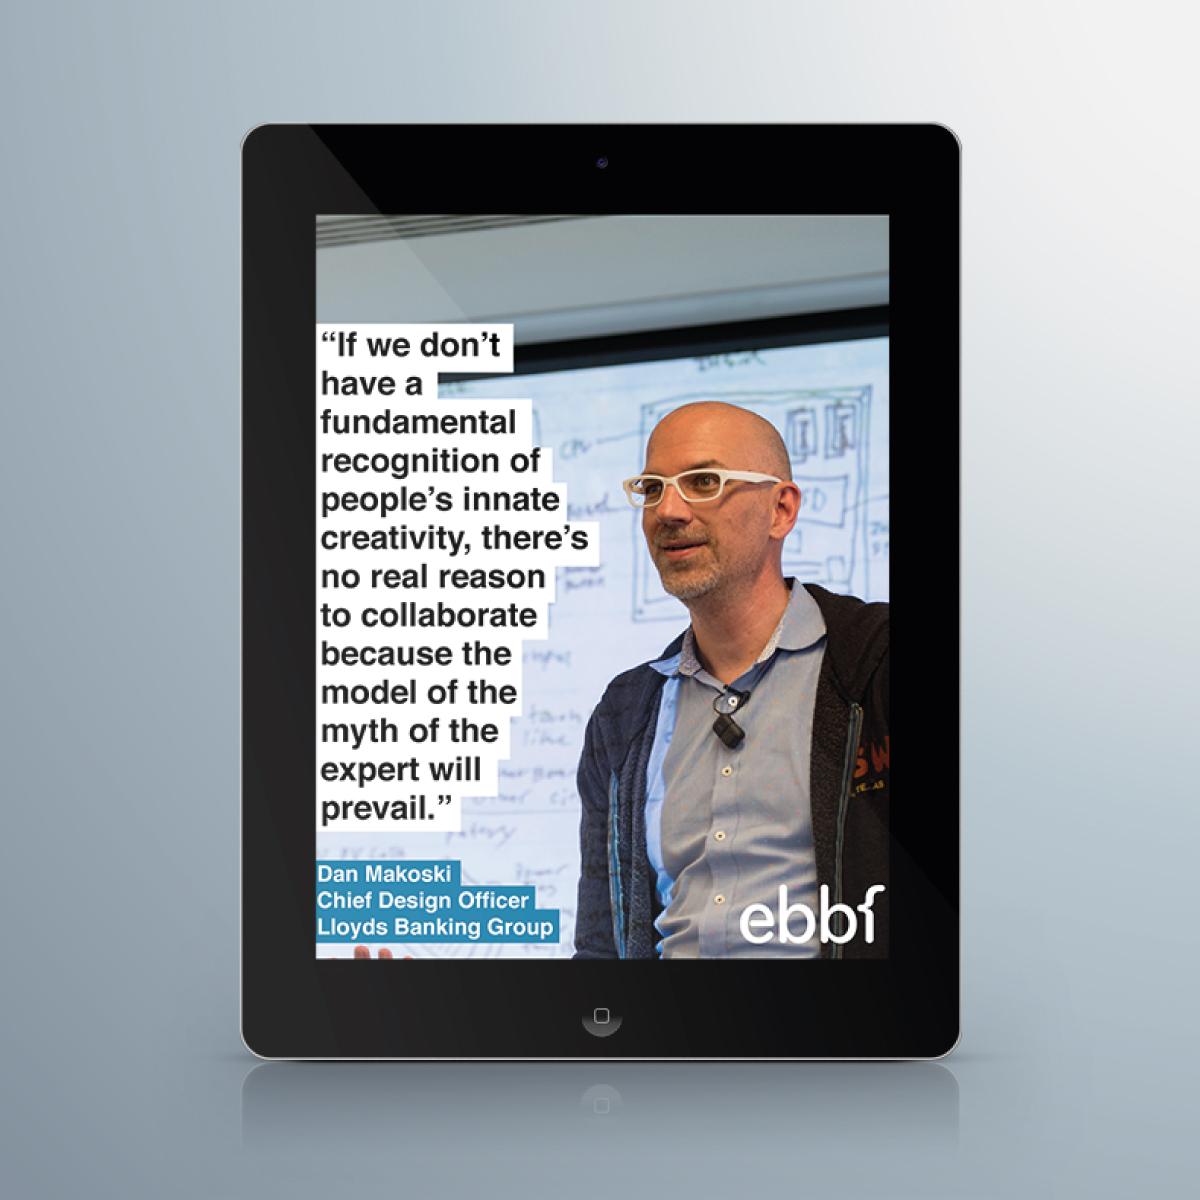 ebbf uk digital campaigns